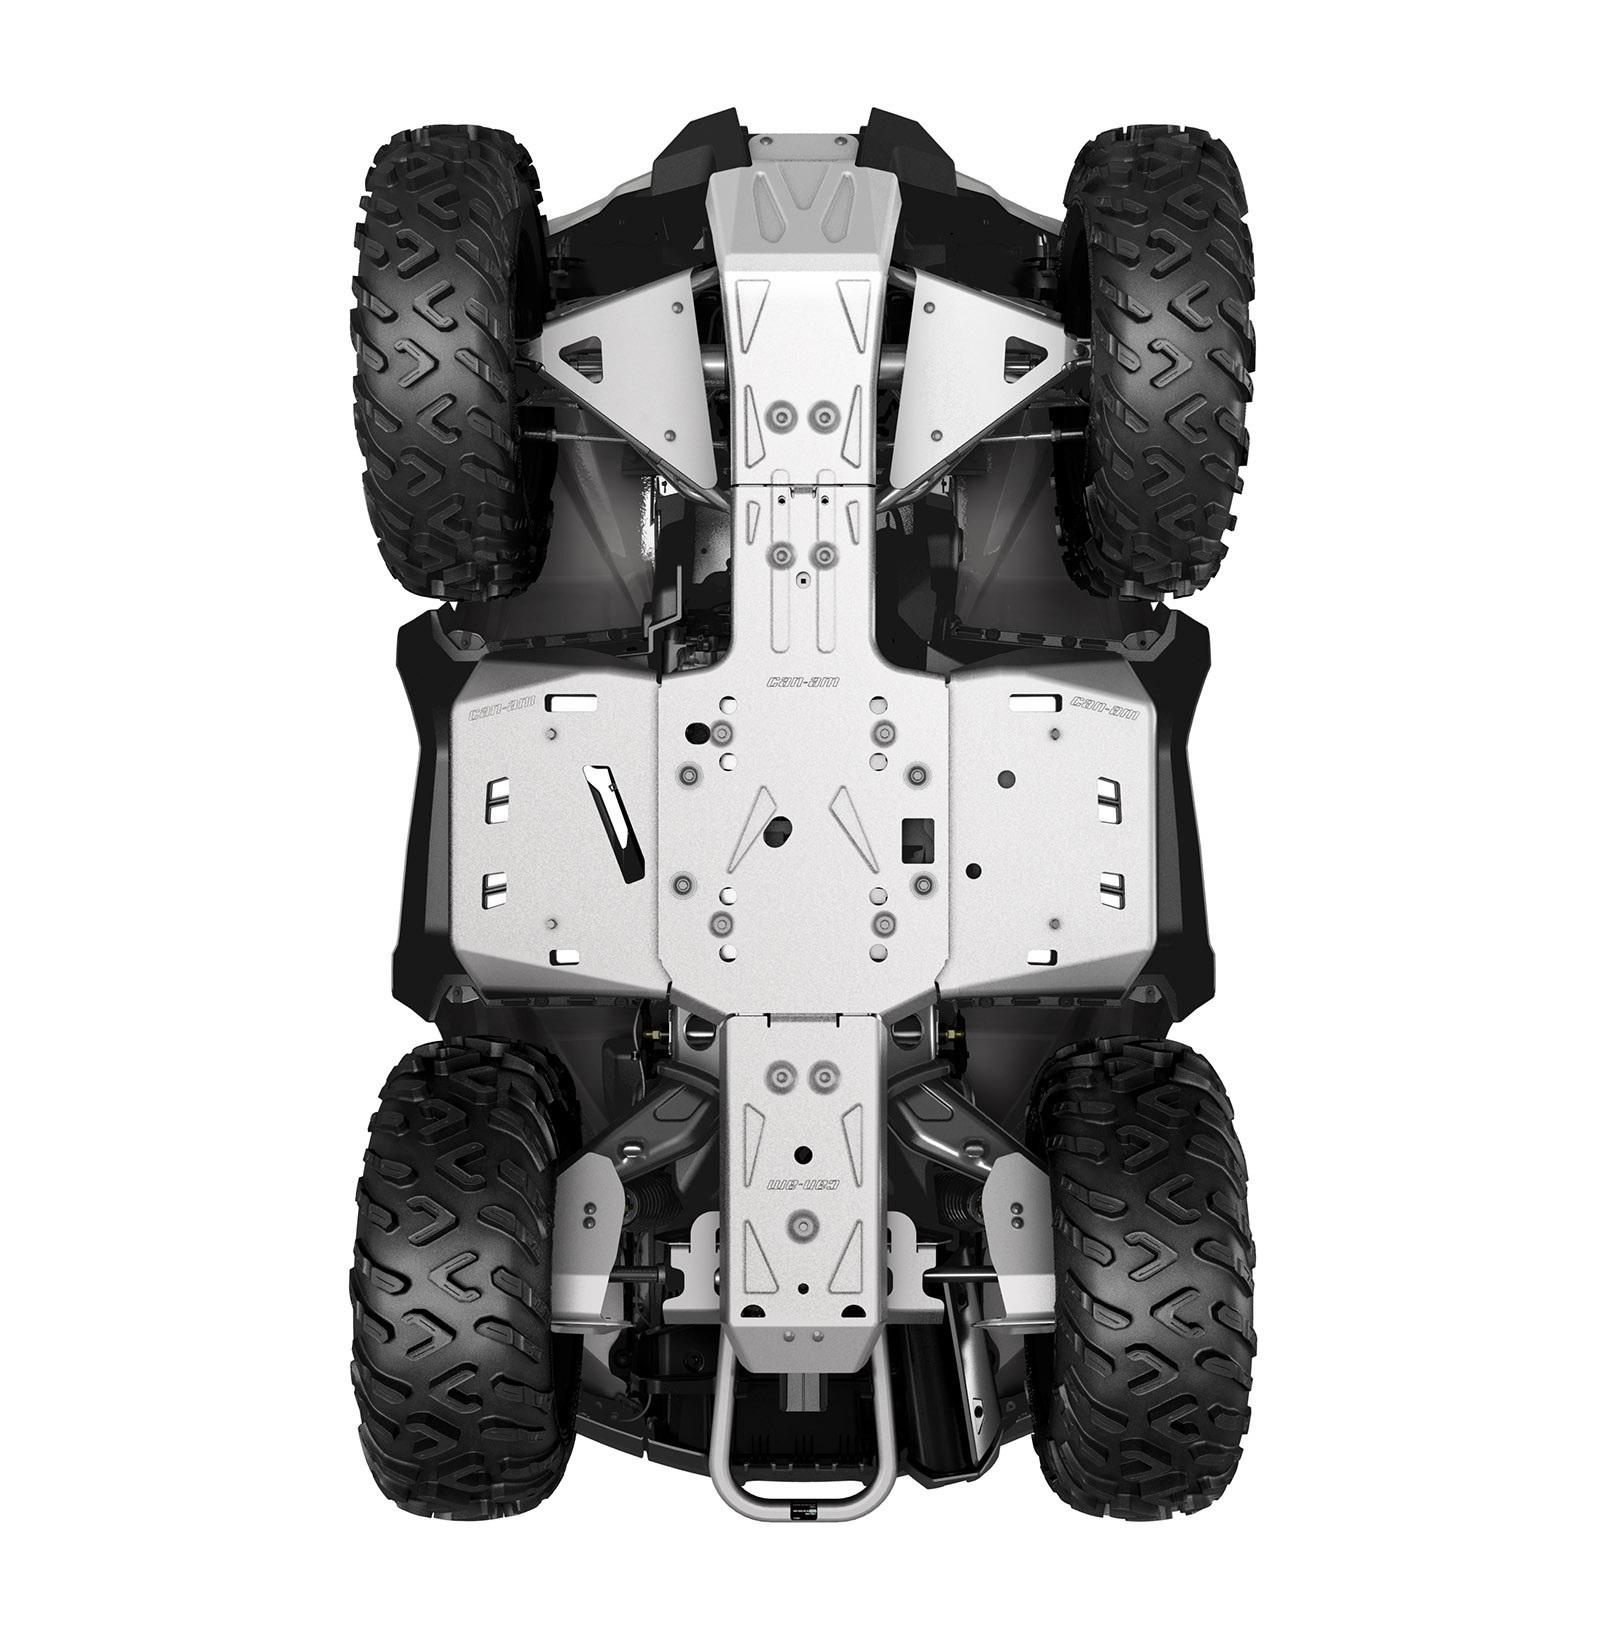 ALUMINUM SKID PLATE KIT, G2 (2017-2018) (Iba modely MAX, X mr 1000R)